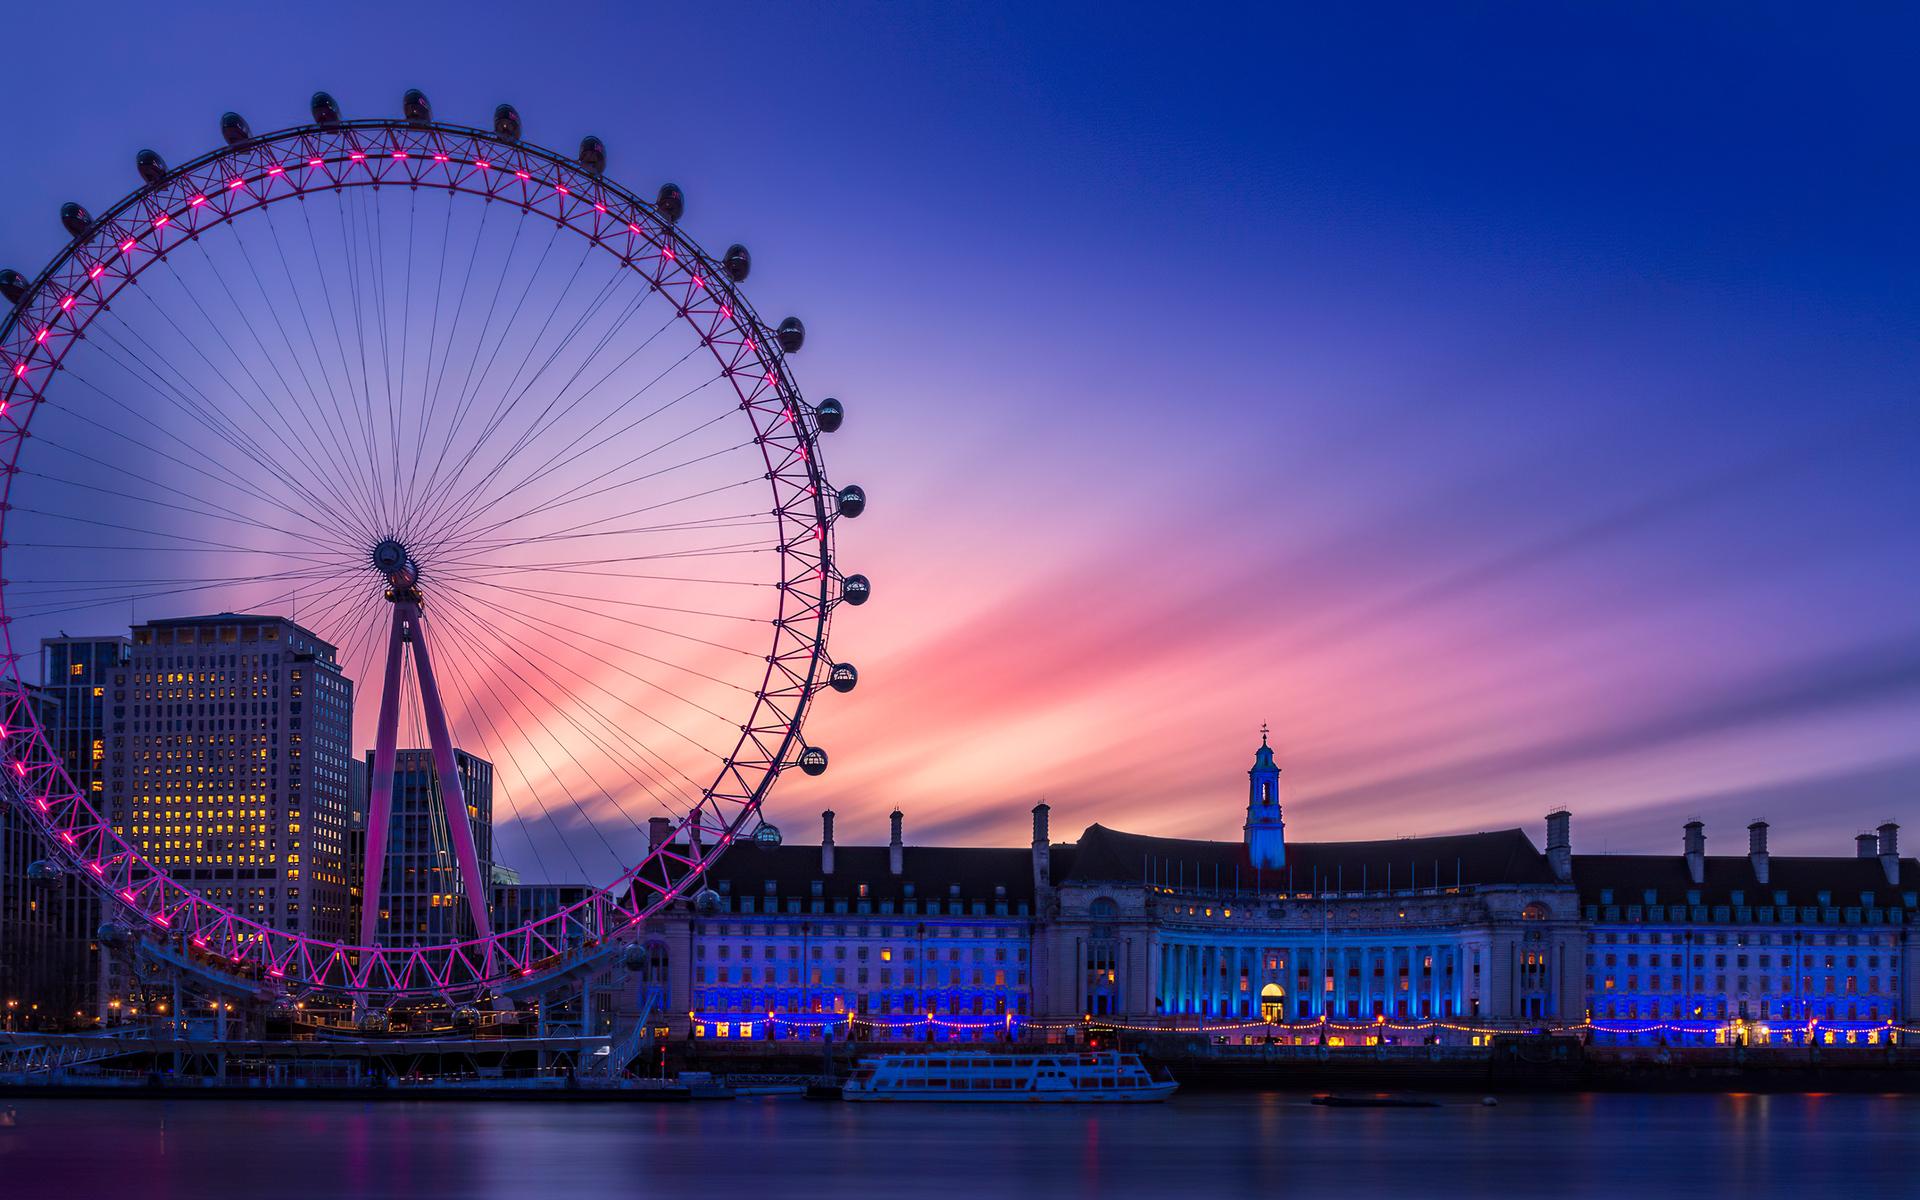 dawn-at-the-london-eye-4k-7f.jpg